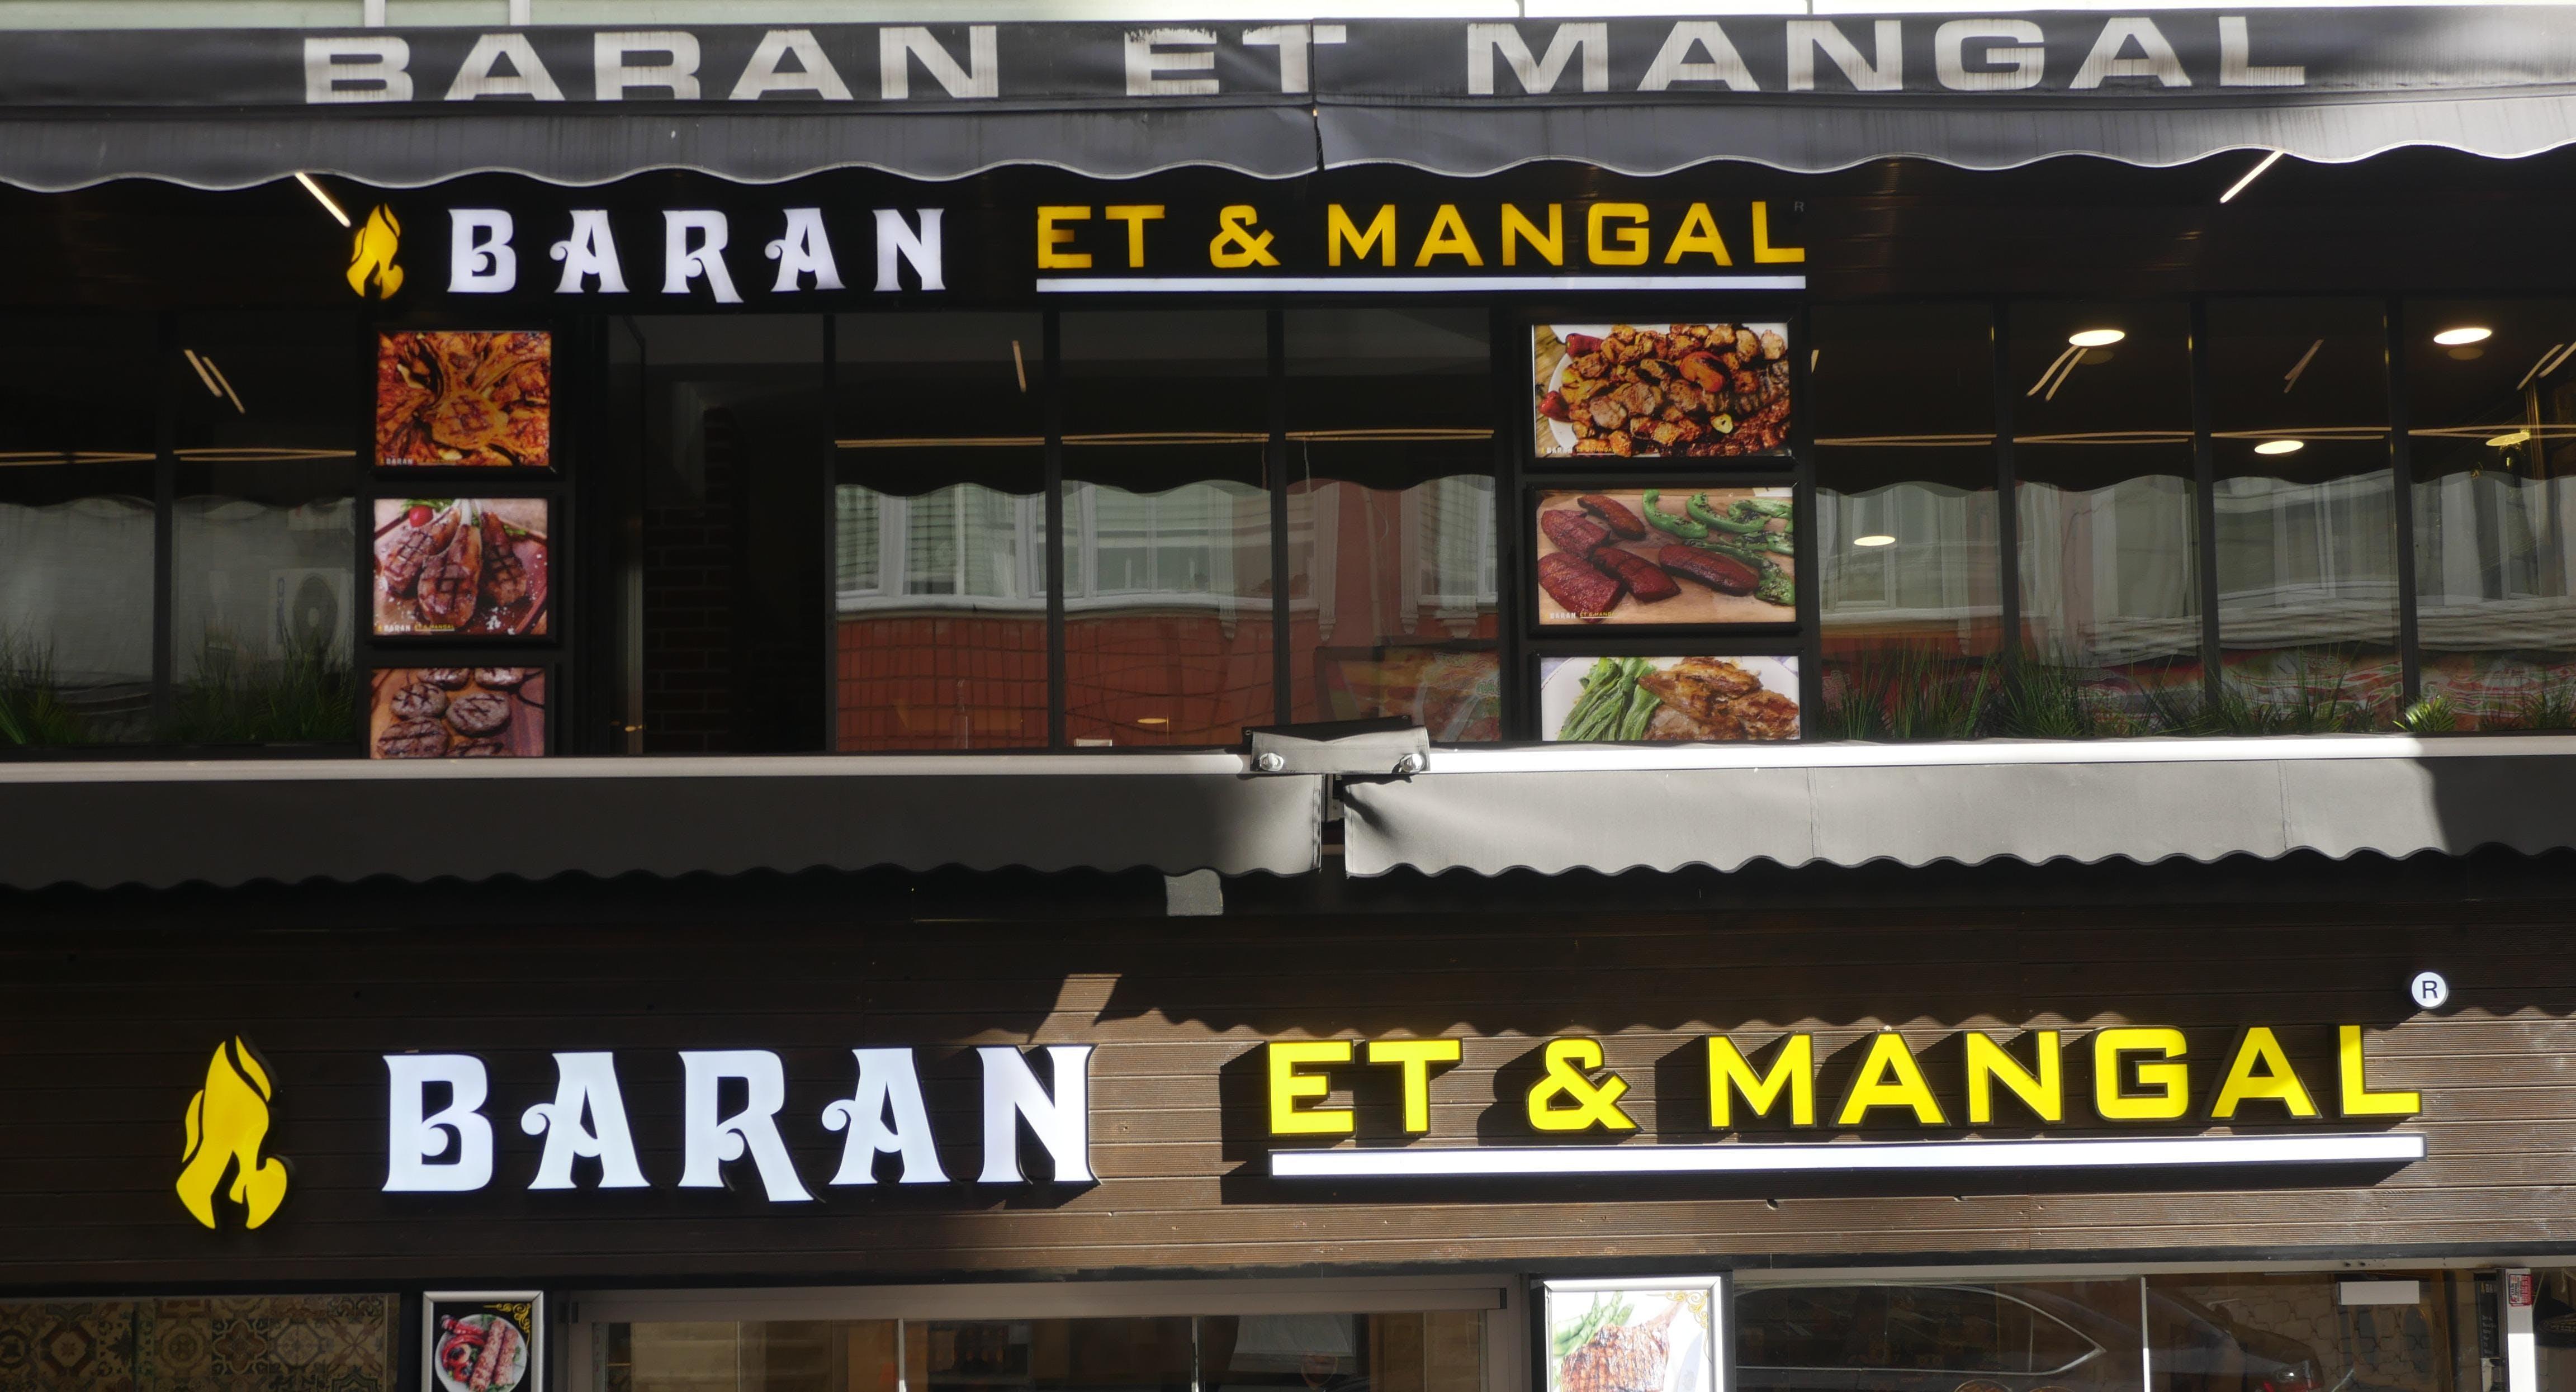 Baran Et & Mangal